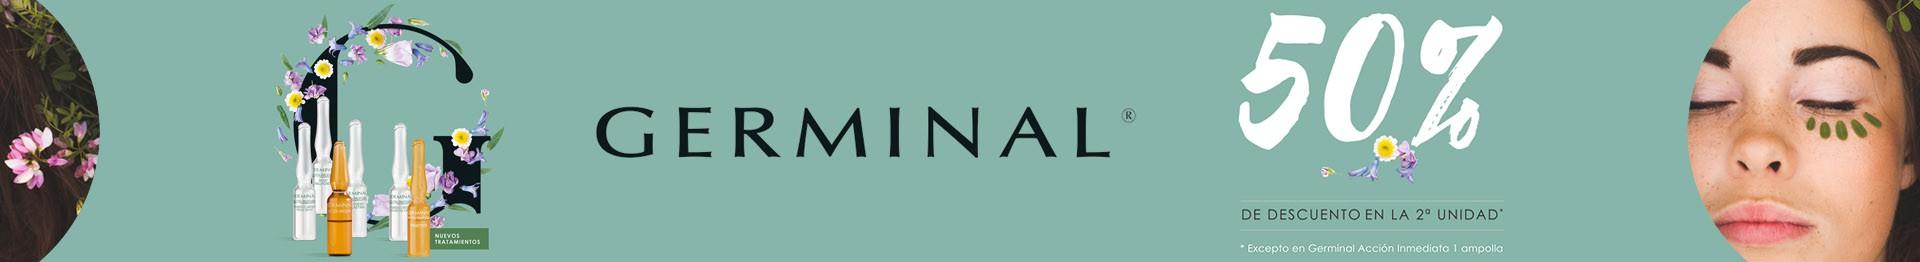 promo germinal